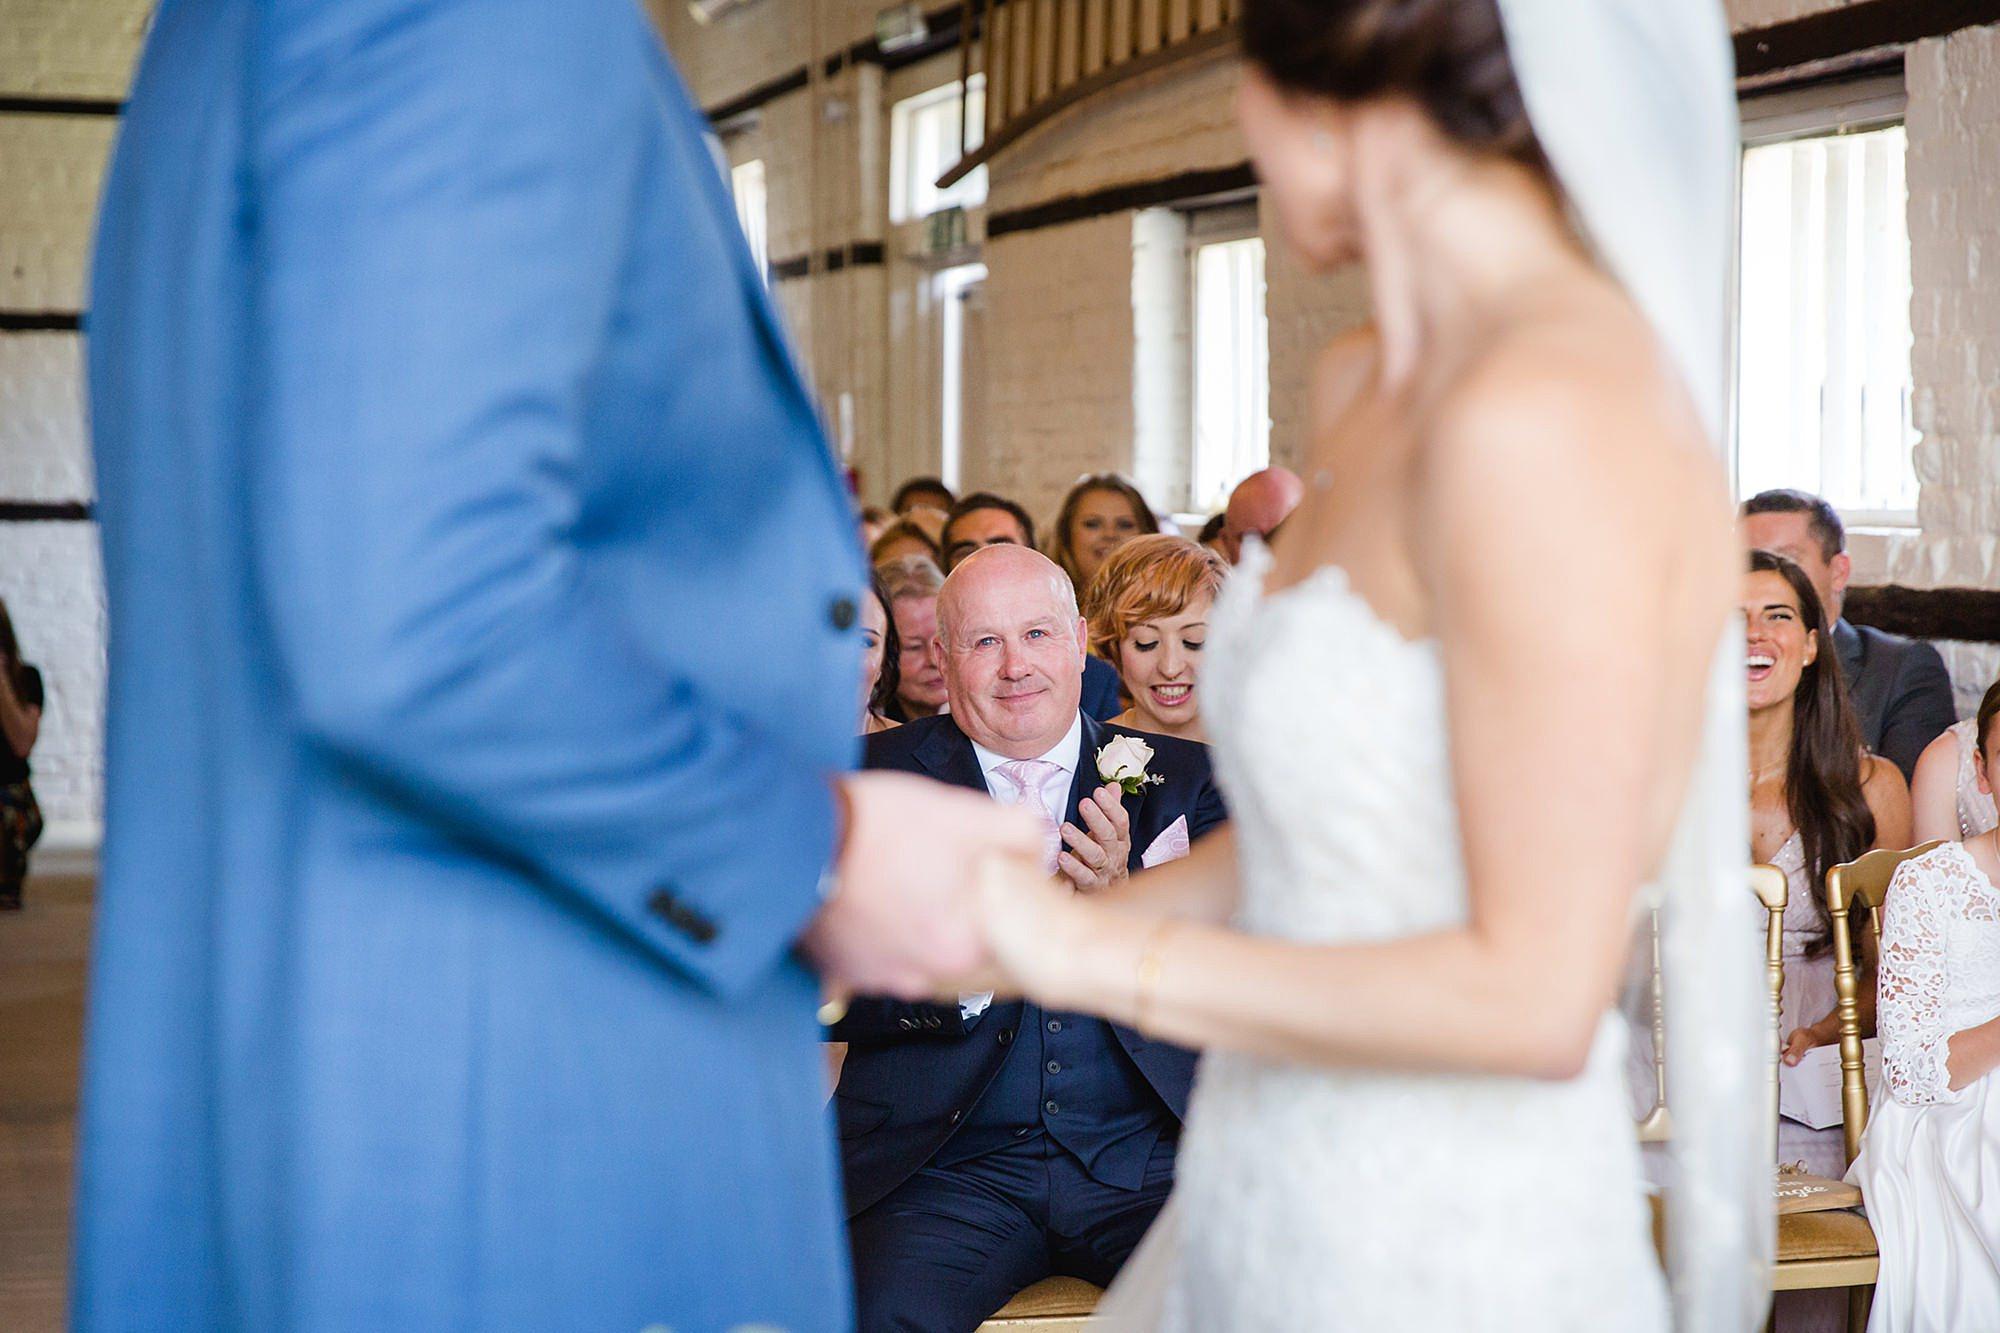 Lillibrooke Manor wedding father of bride applauds newlyweds